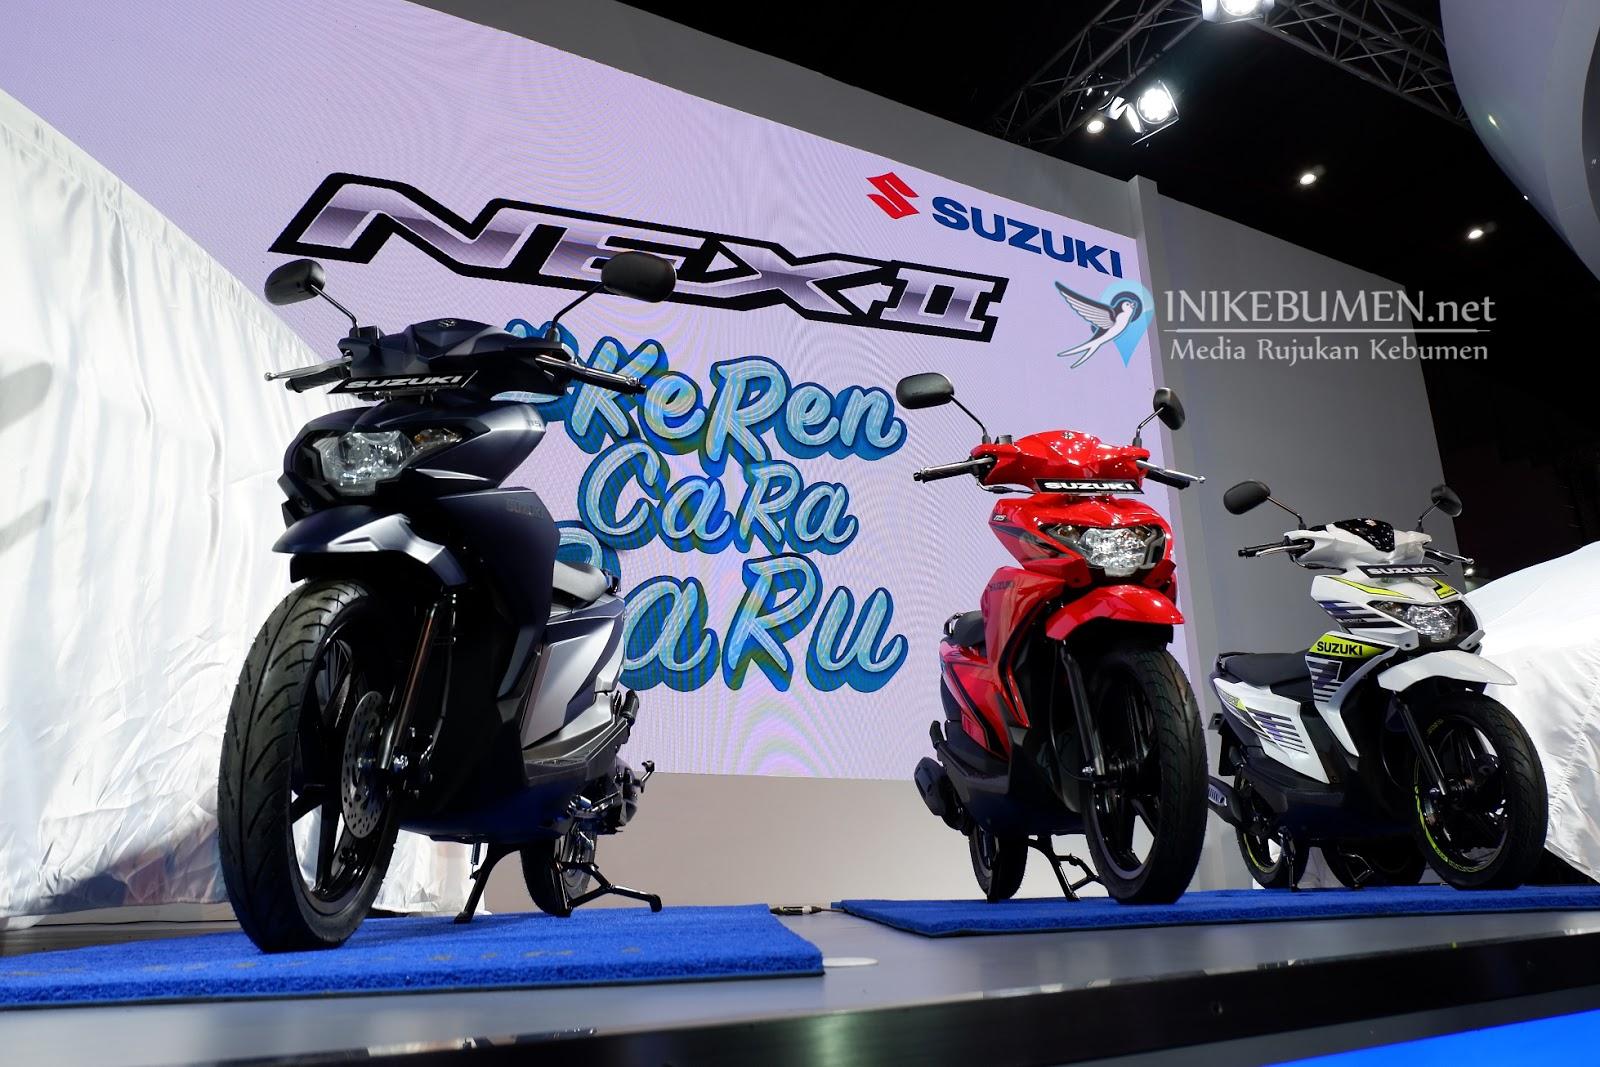 Suzuki Perkenalkan NEX II Kepada Publik Indonesia Untuk Pertama Kali